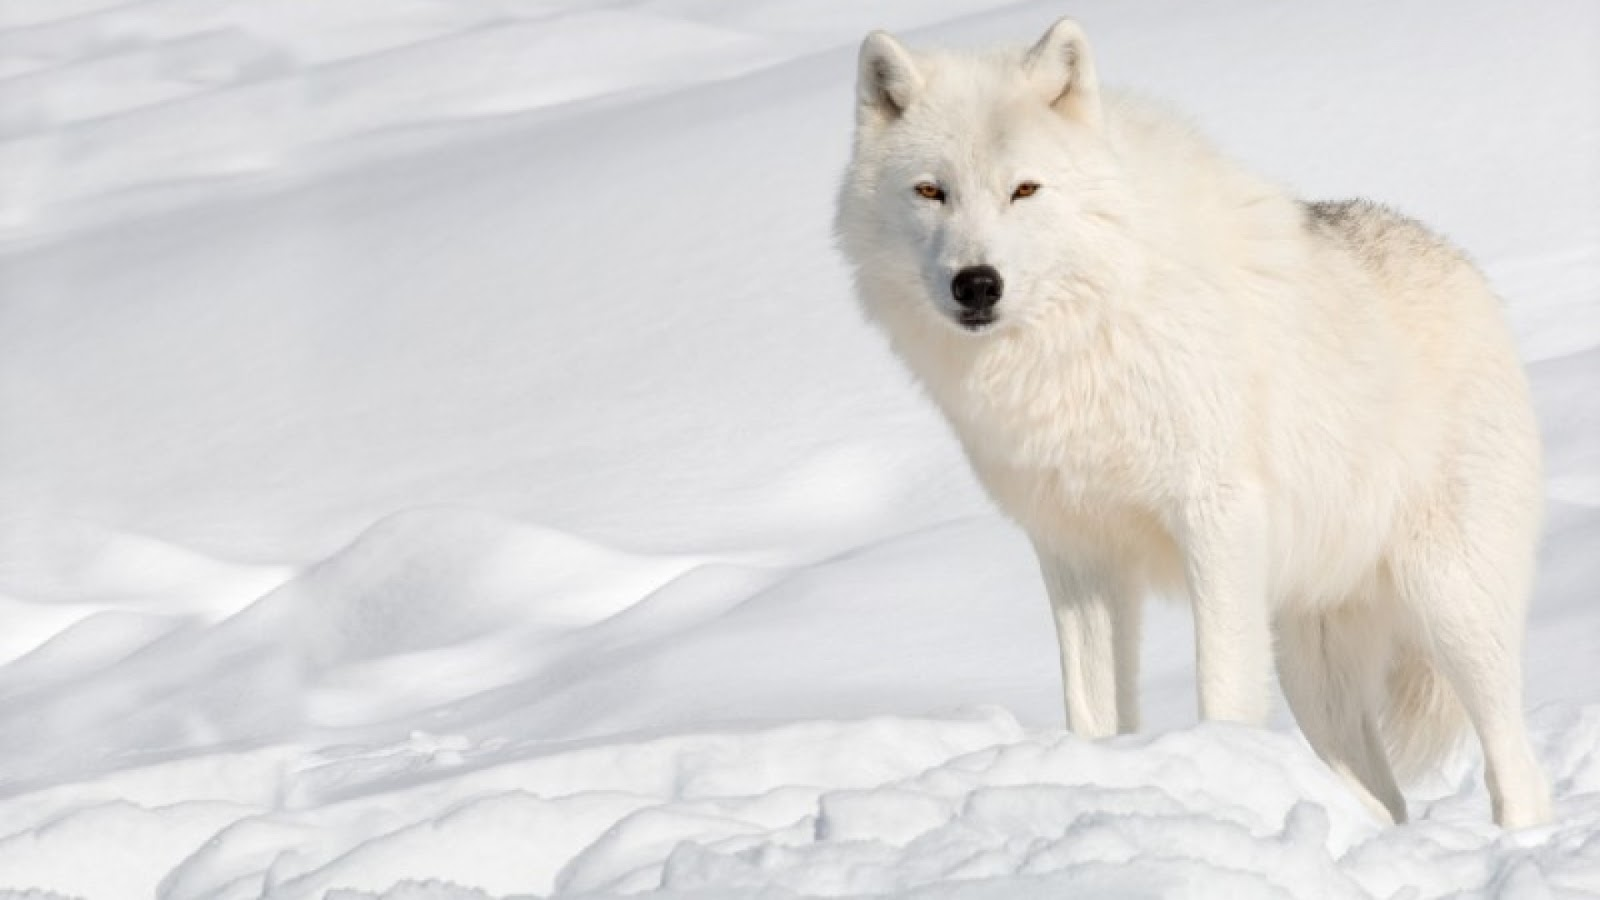 Arctic wolf in snow - photo#4